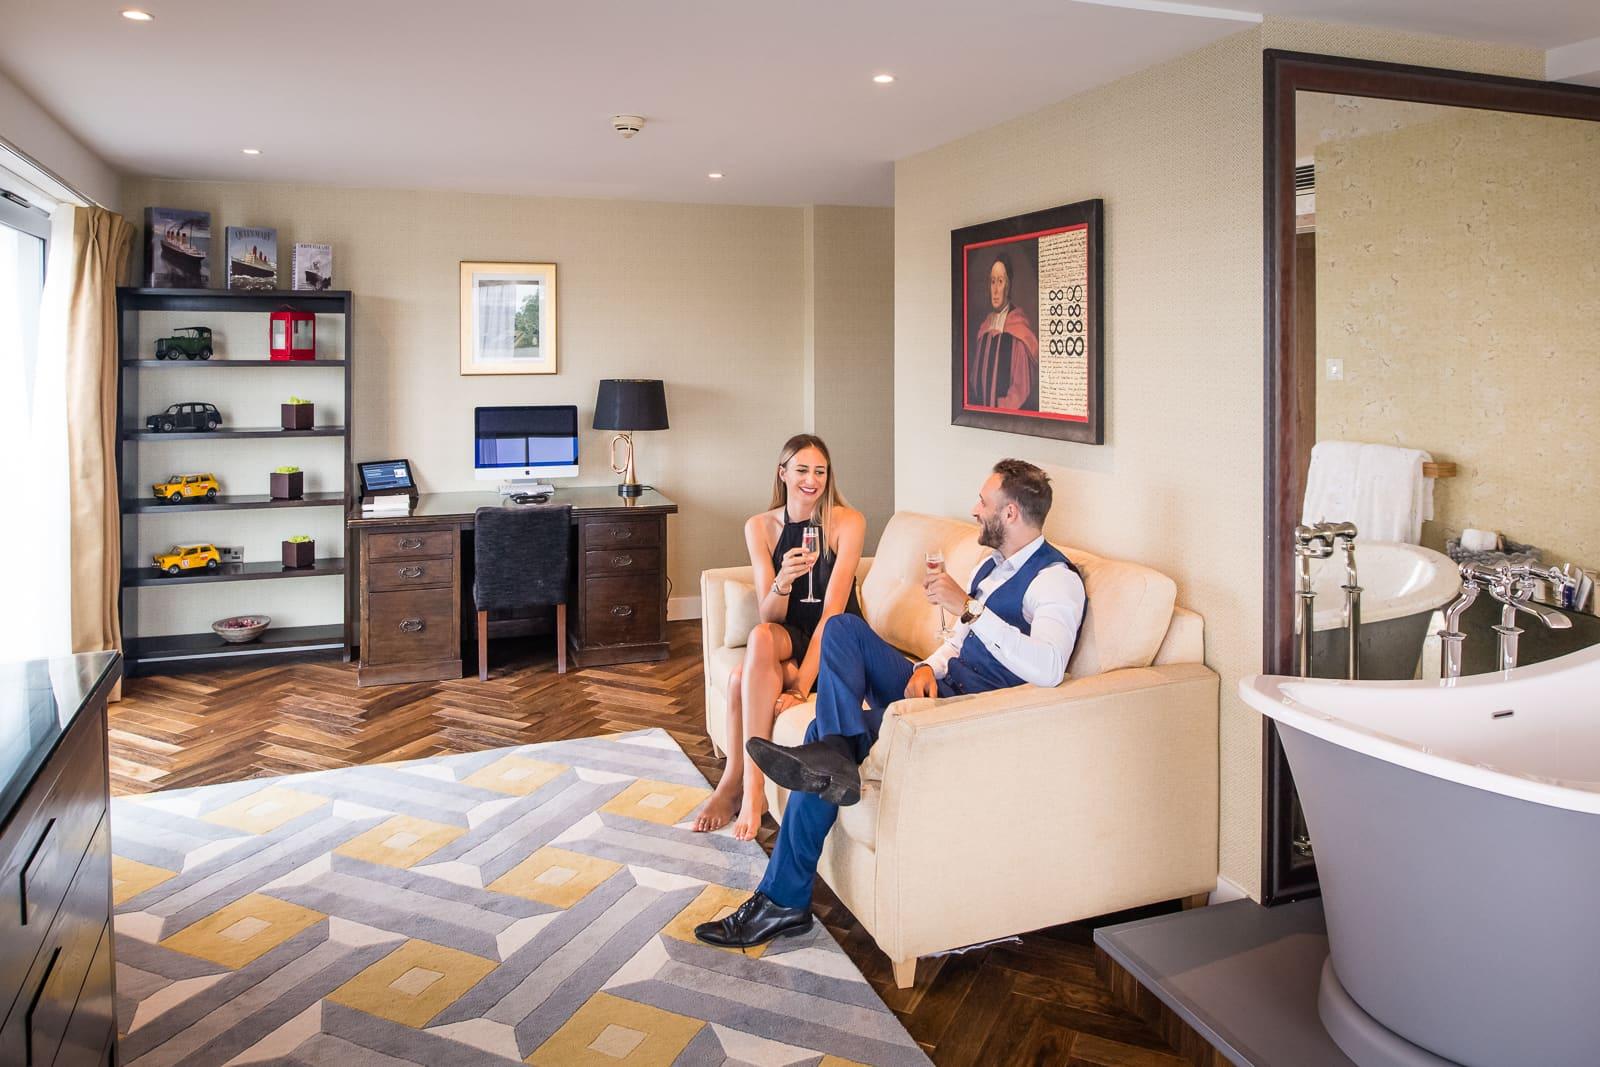 Uniquely Designed Rooms The Varsity Boutique Hotel Cambridge